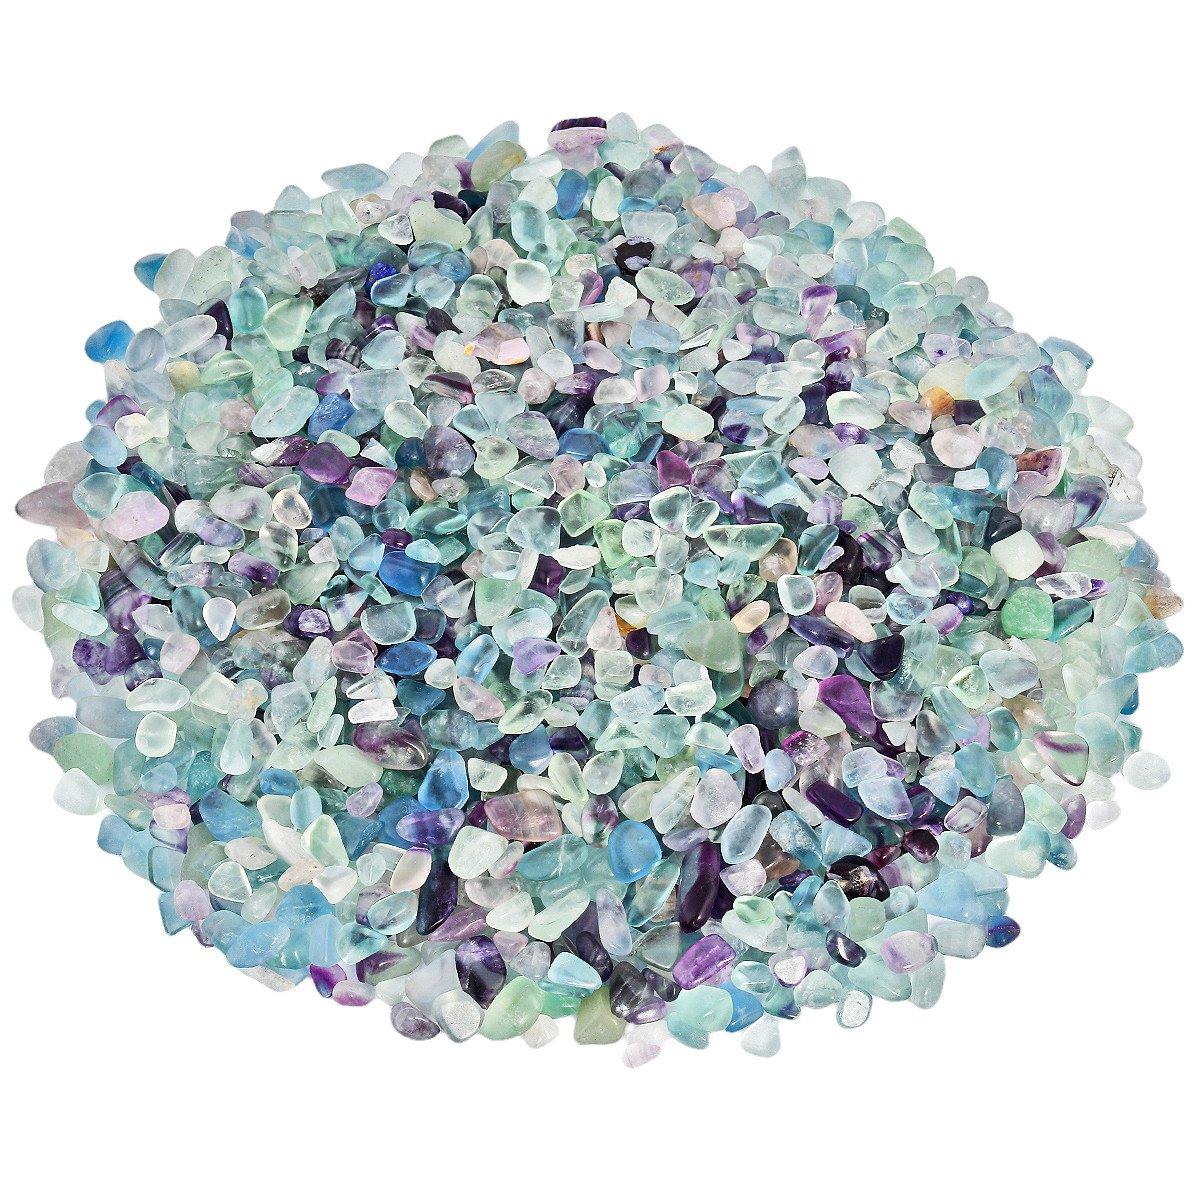 SUNYIK Fluorite Tumbled Chips Stone Crushed Crystal Quartz Pieces Irregular Shaped Stones 1pound(about 460 gram) by SUNYIK